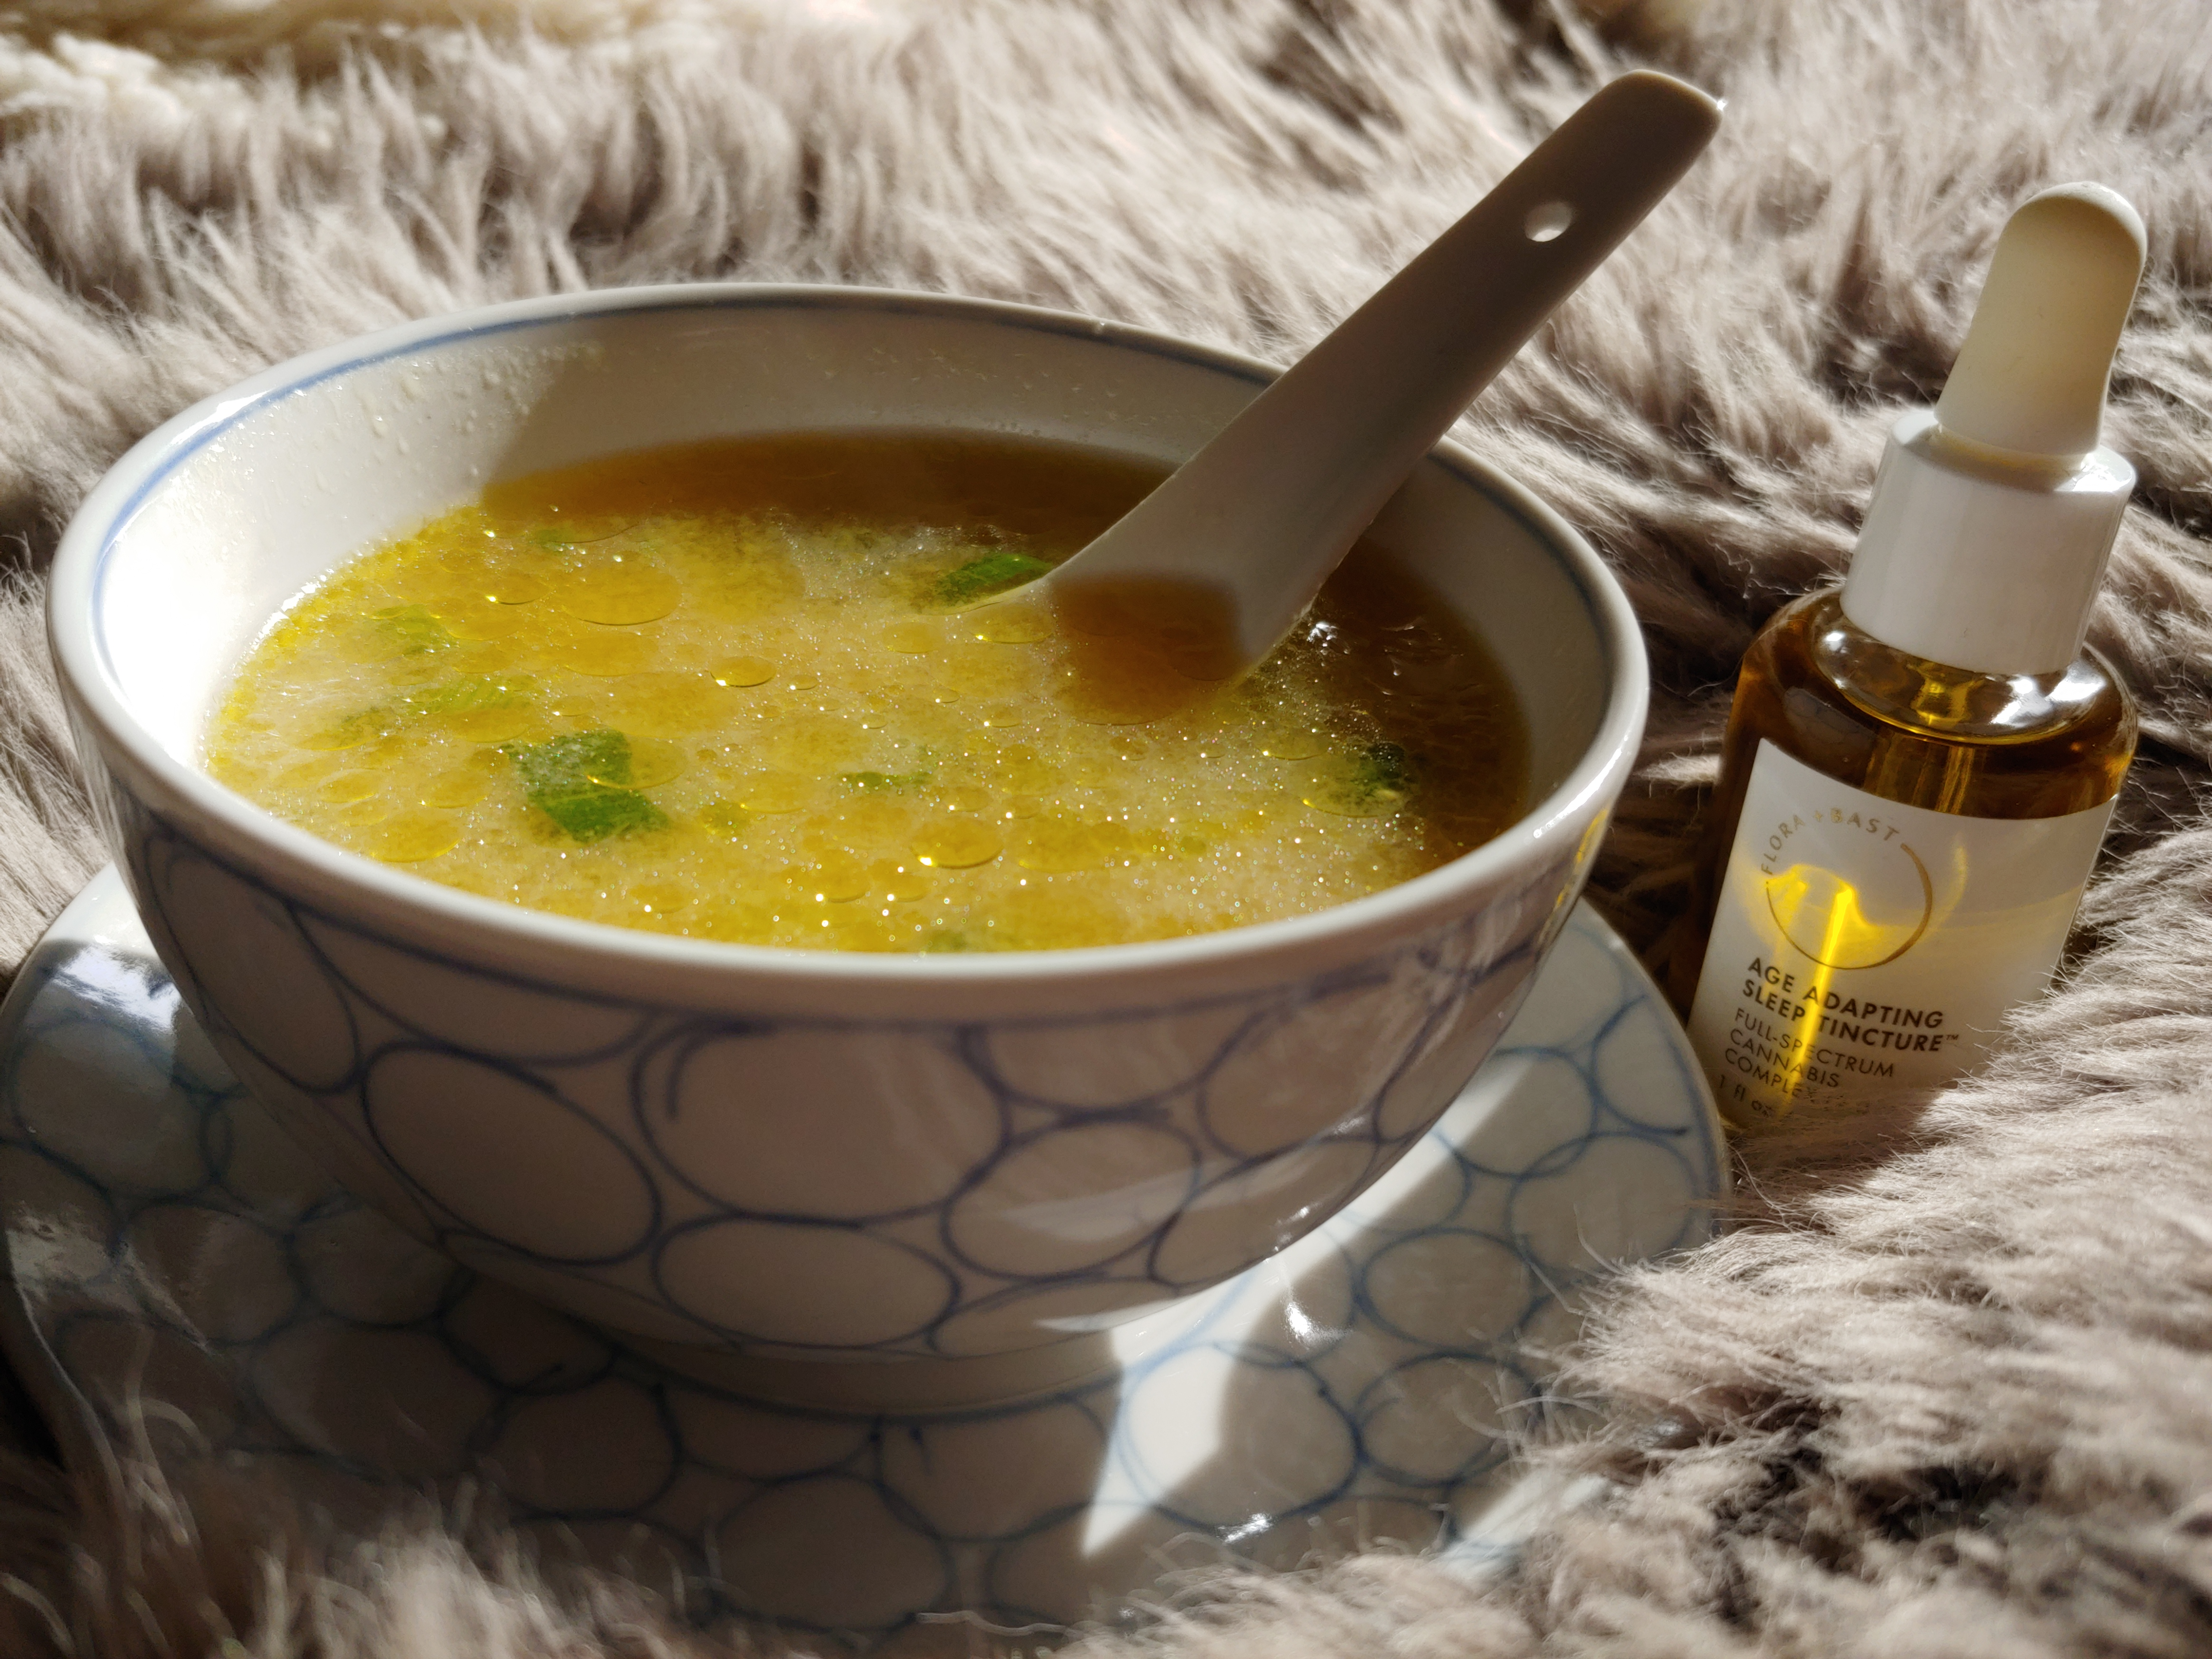 Vegan Gluten-Free Miso Broth Recipe